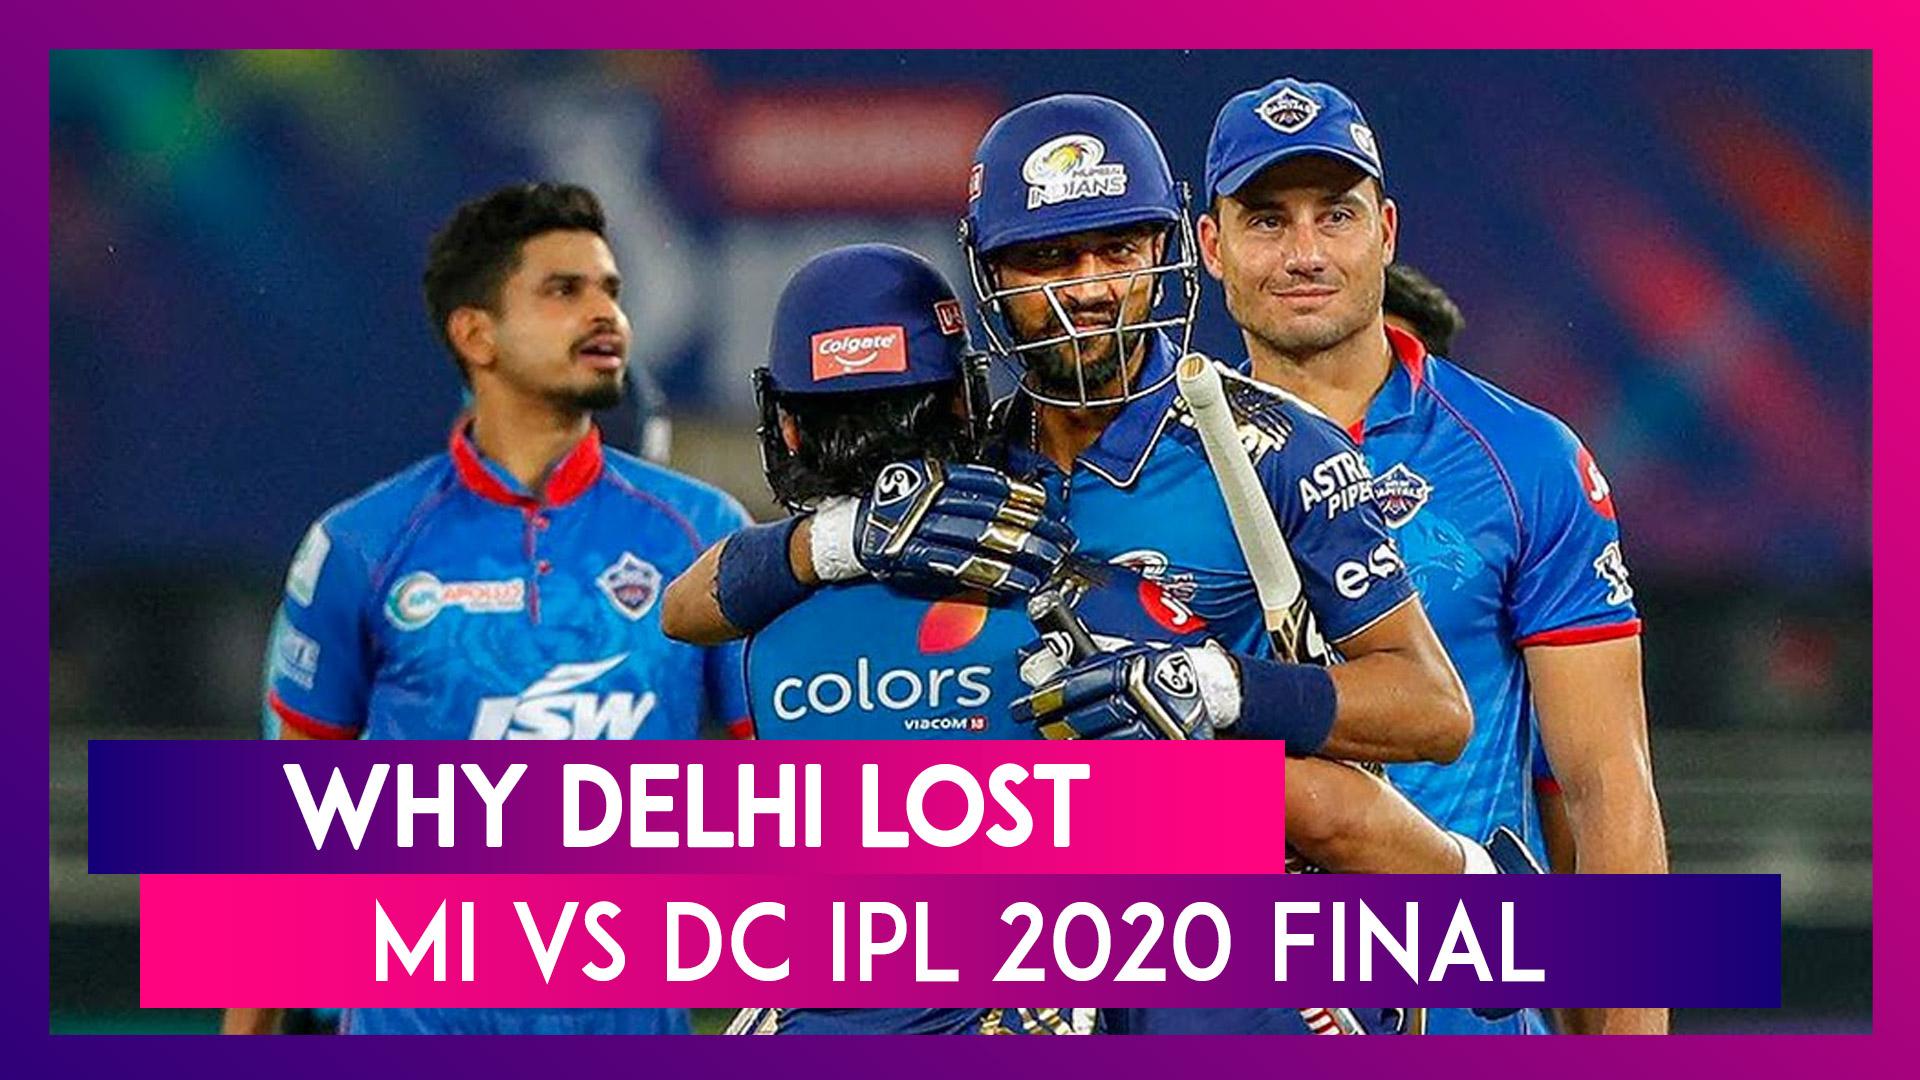 Mumbai vs Delhi IPL 2020 Final: 2 Reasons Why Mumbai Won And 3 Reasons Why Delhi Lost